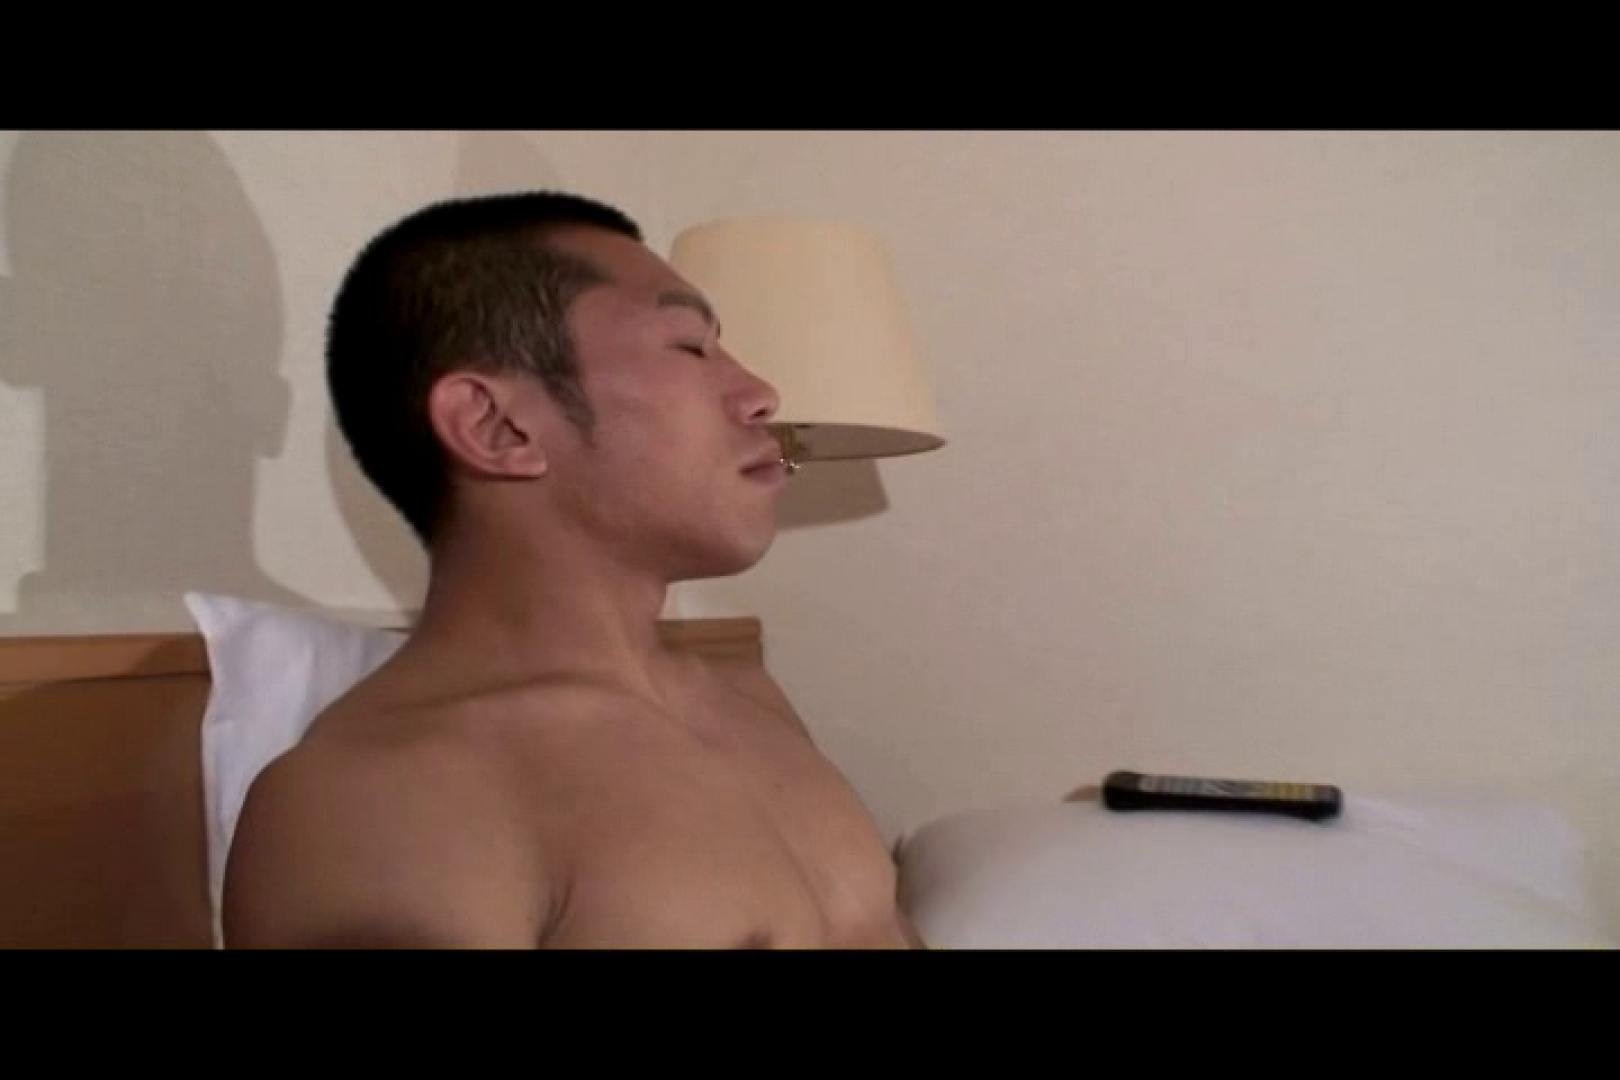 Bistro「イケメン」~Mokkori和風仕立て~vol.04 オナニー | イケメンズ アダルトビデオ画像キャプチャ 91枚 38